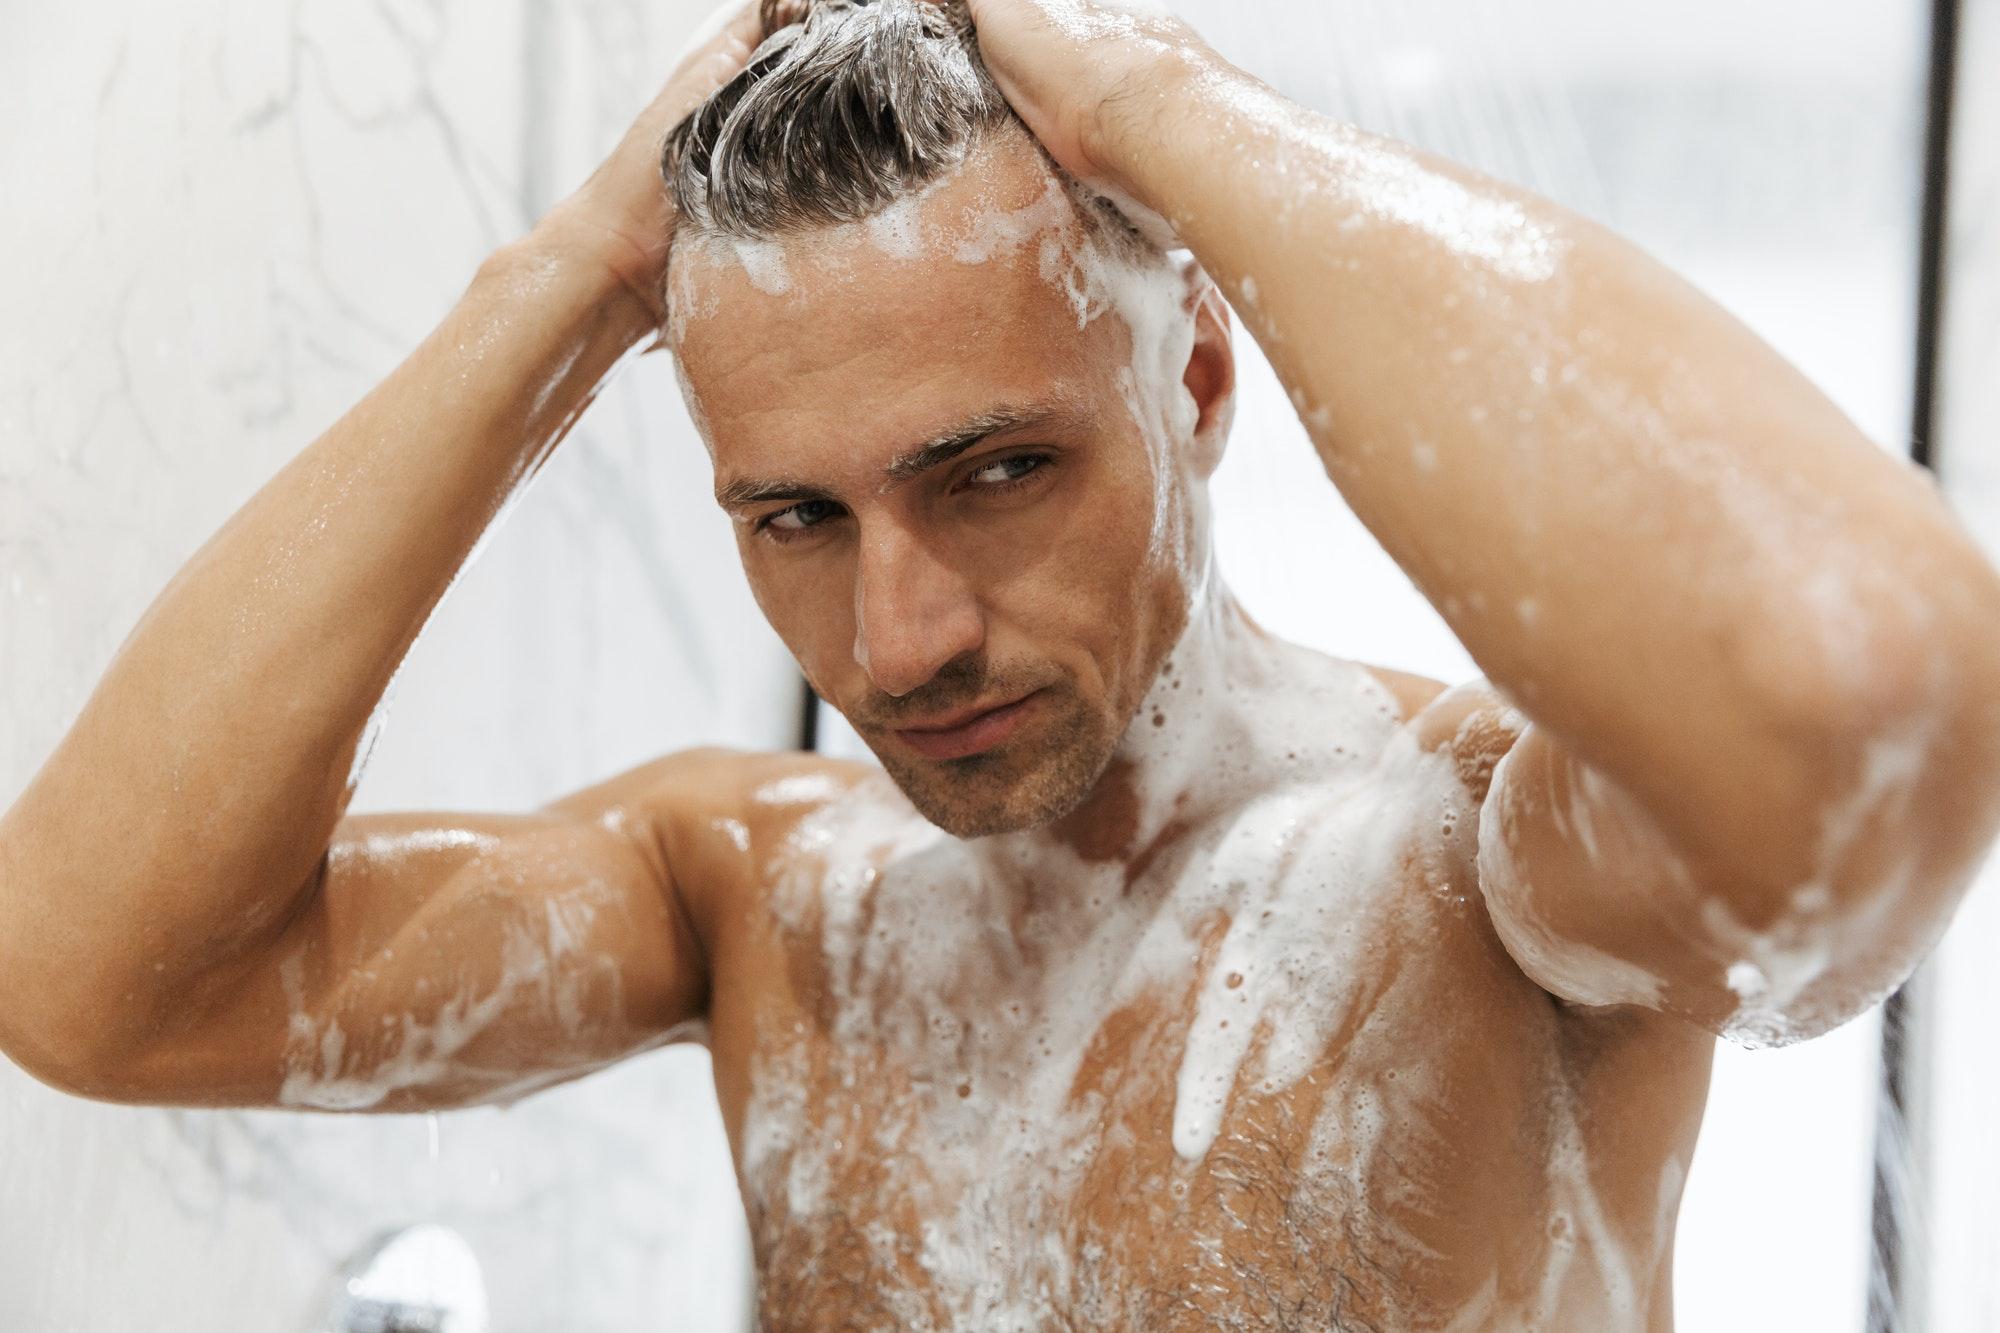 Close up of a confident man having a shower